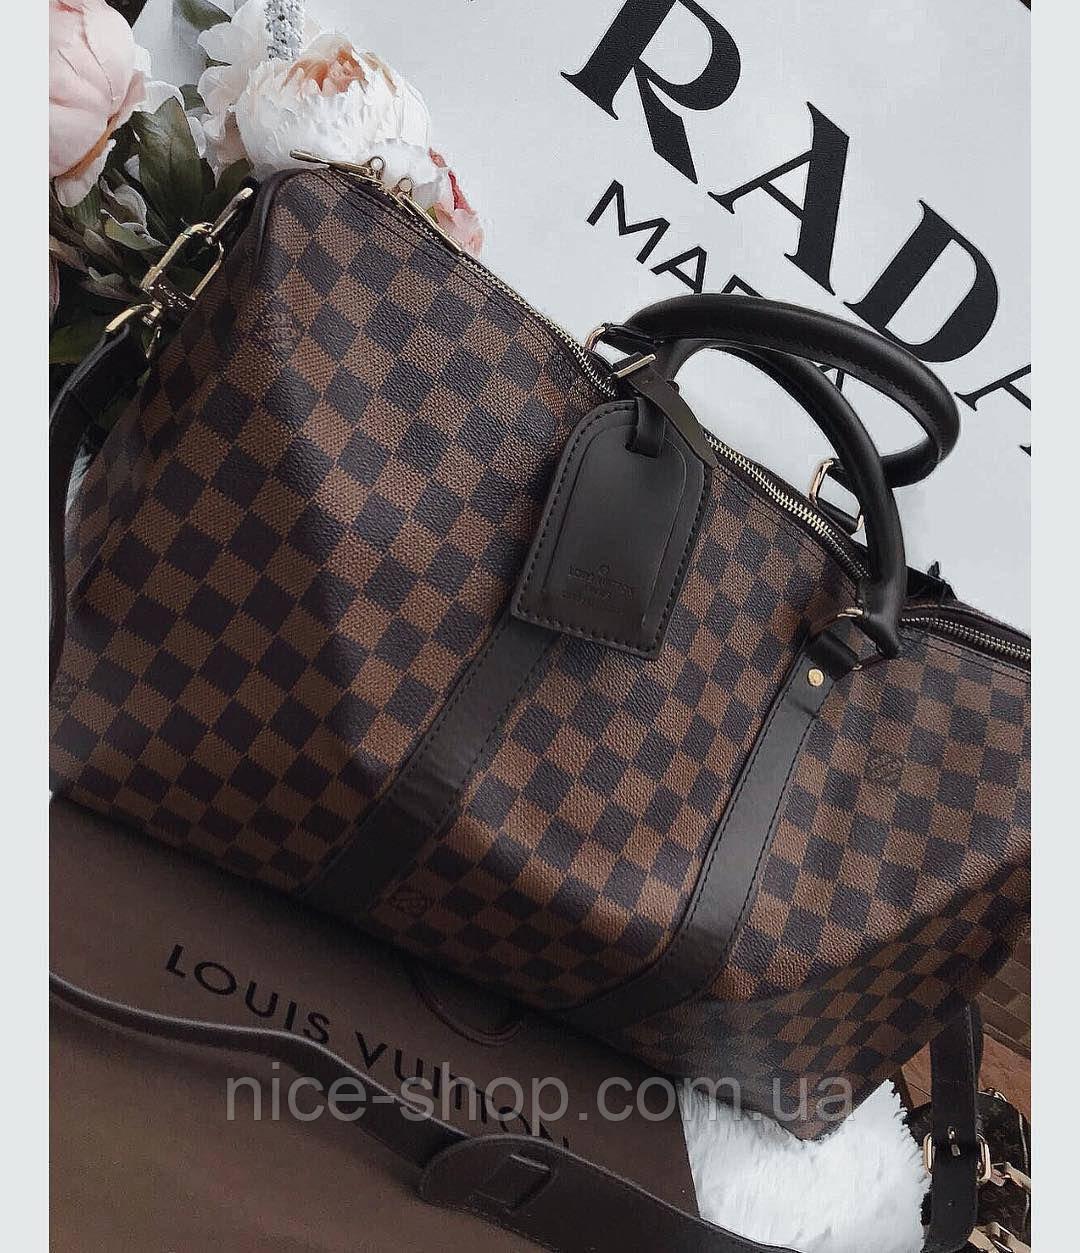 Сумка Louis Vuitton Keppall, 55 см, коричневий шахматка, Люкс